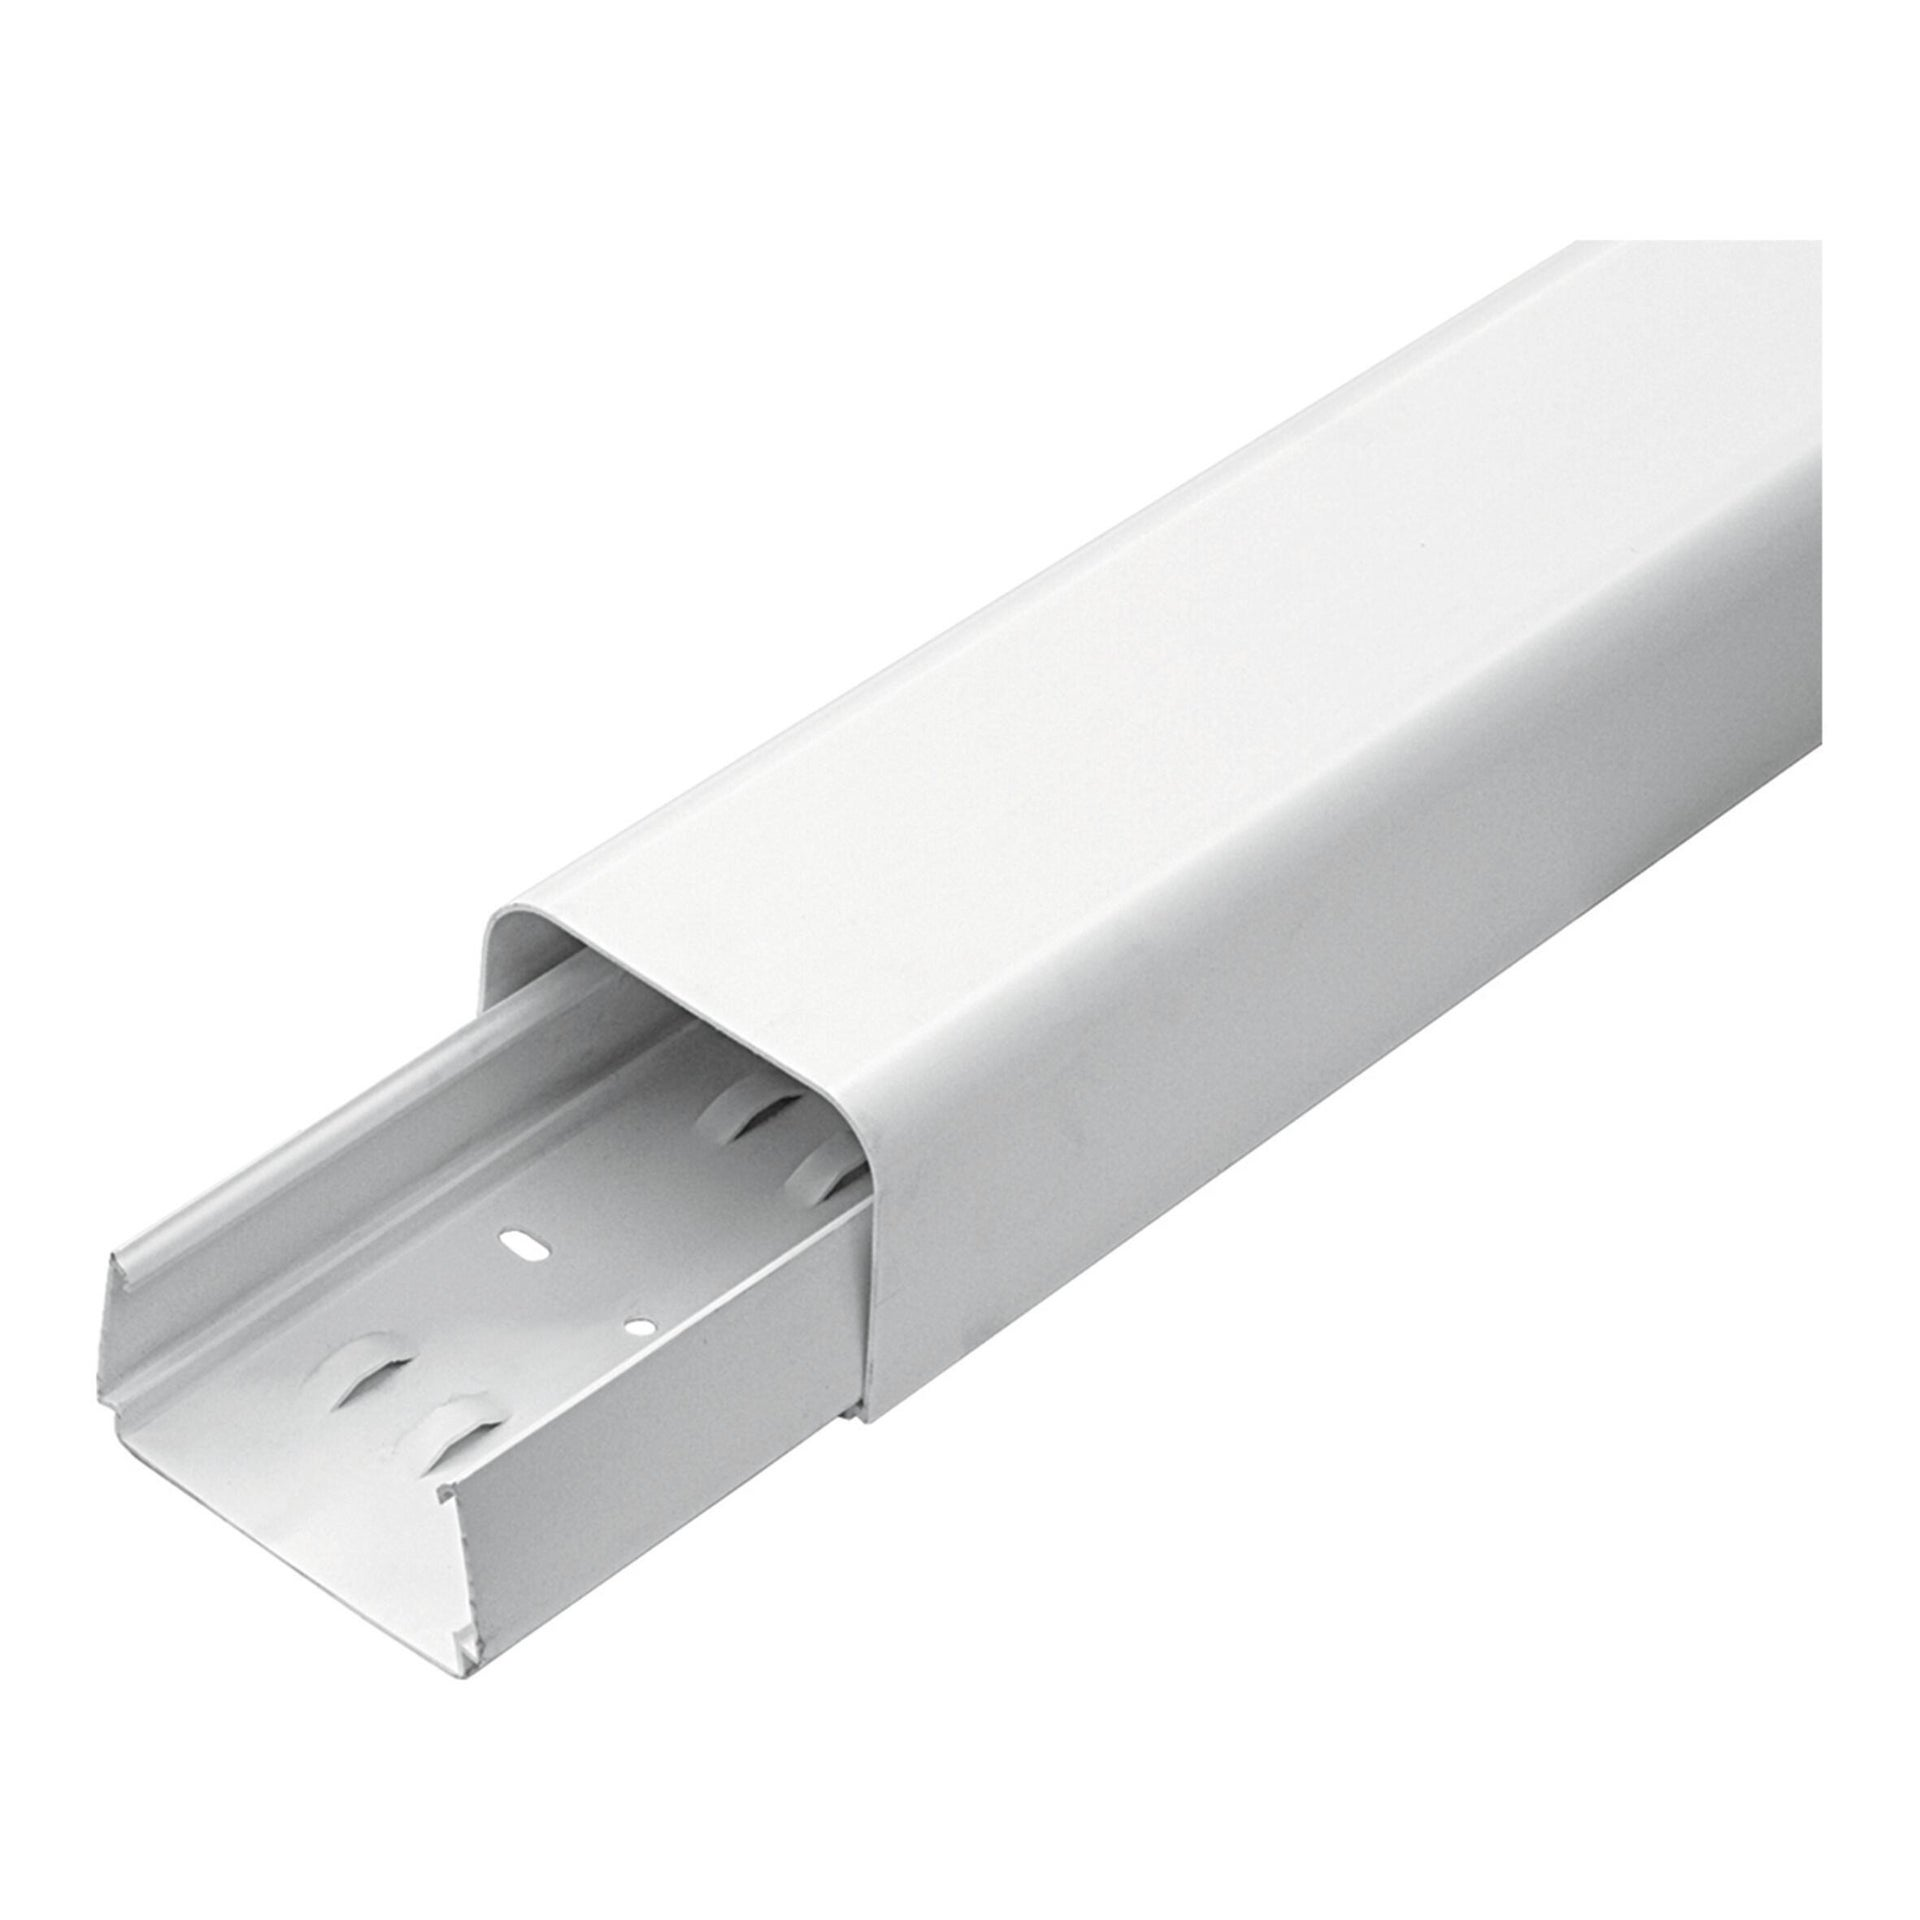 Canalina   6.5 X 200 X 5 cm bianco